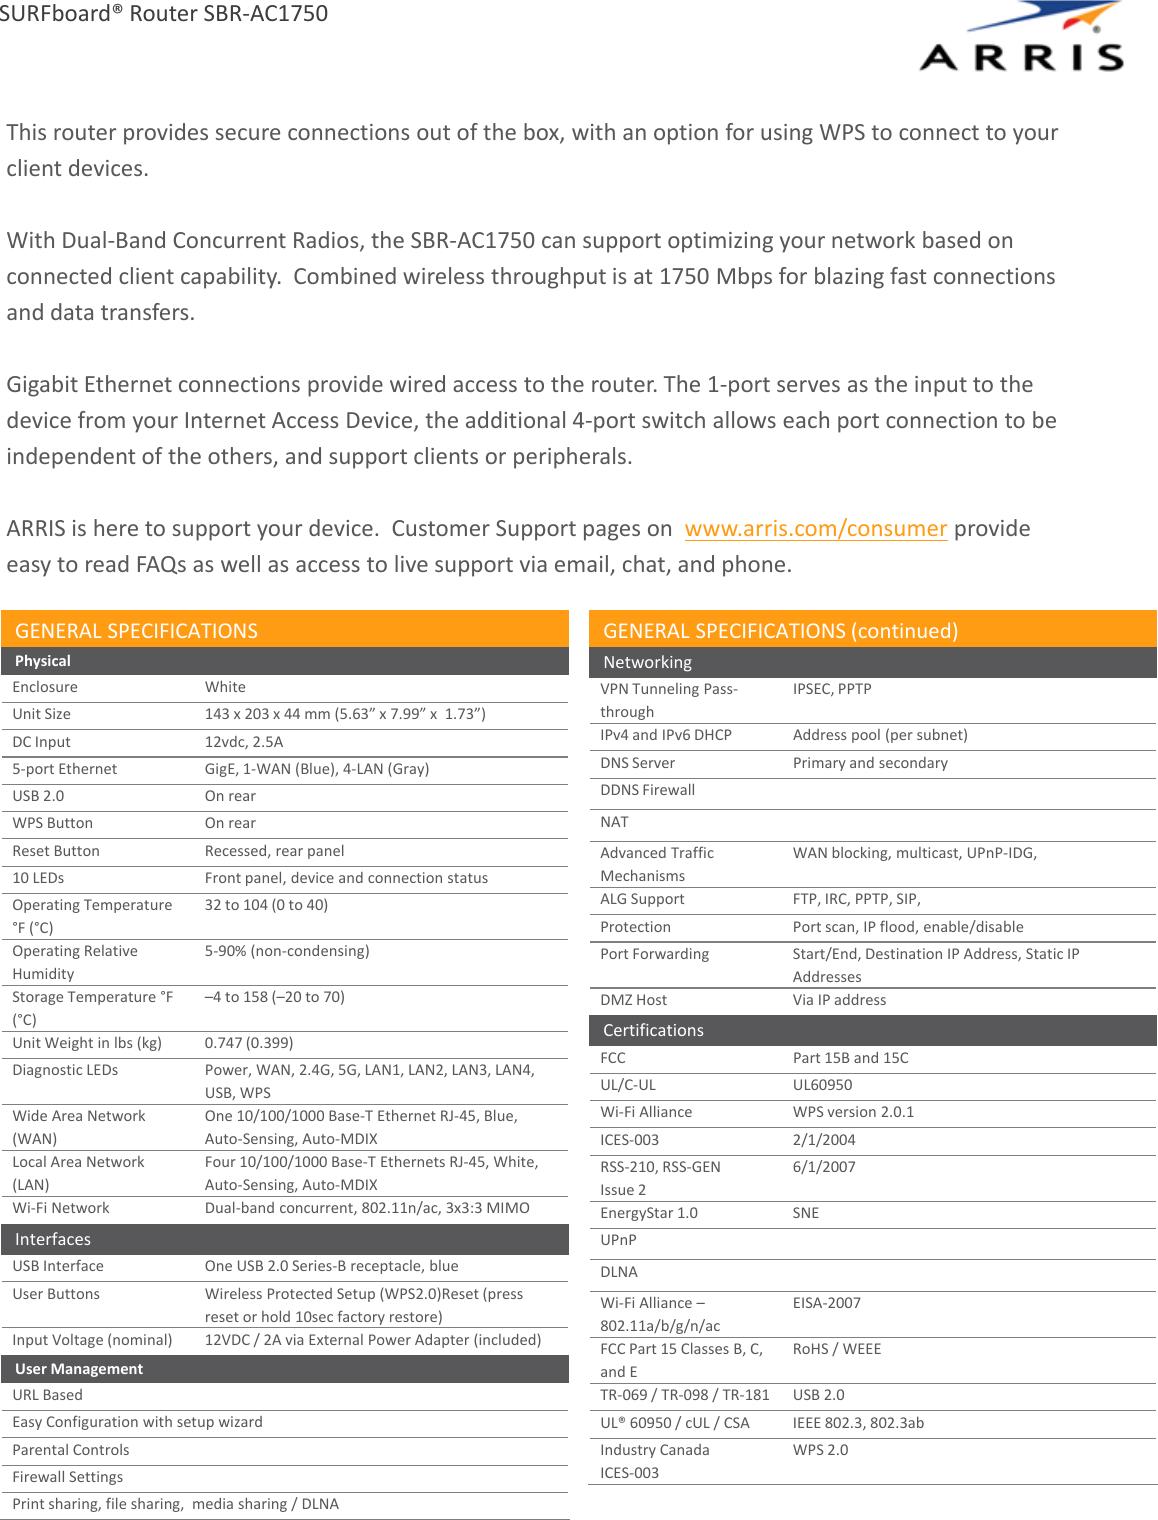 Arris SBR AC1750 1 User Manual Specifications Data Sheet